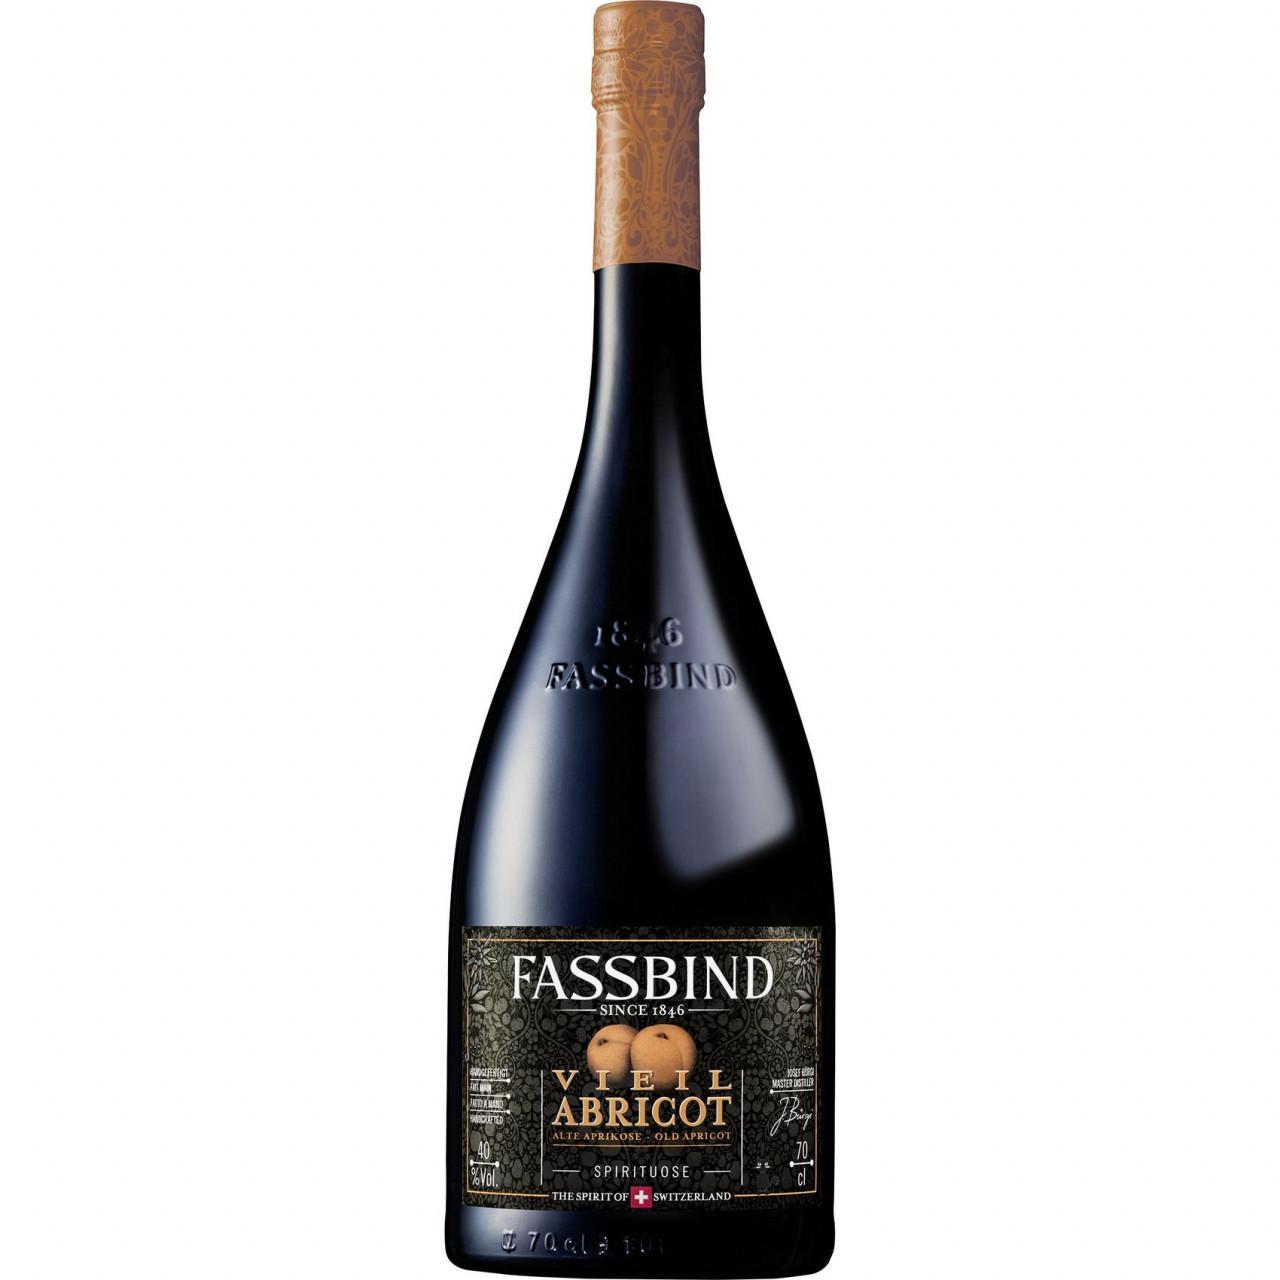 Fassbind Vieil Abricot Barrique 40% 0,7l